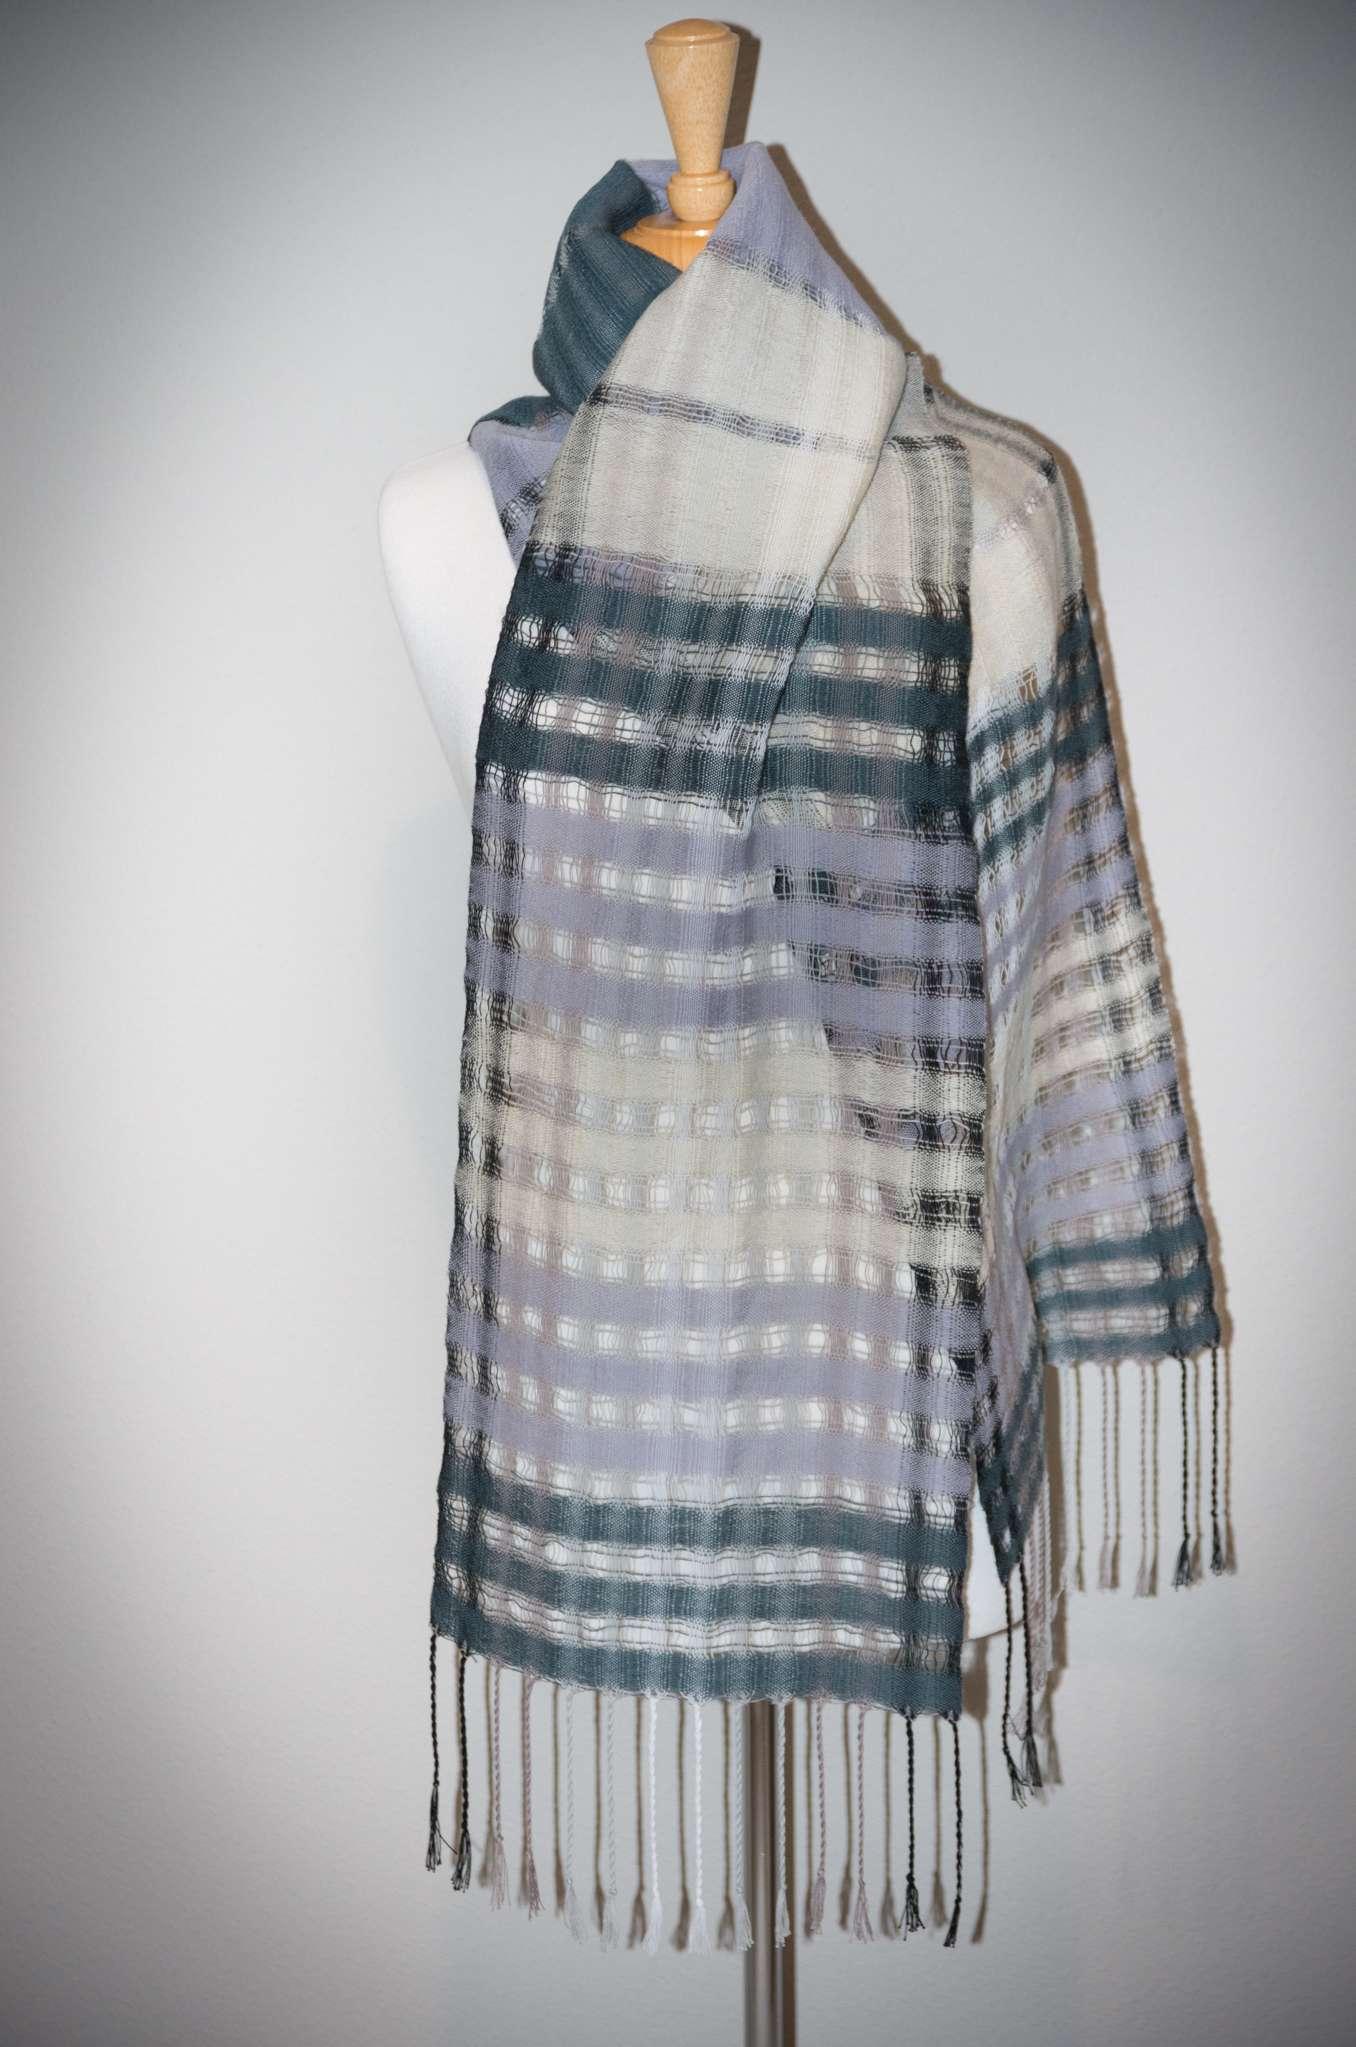 Denting-charcoal, dove grey, cream white wool; cotton warp